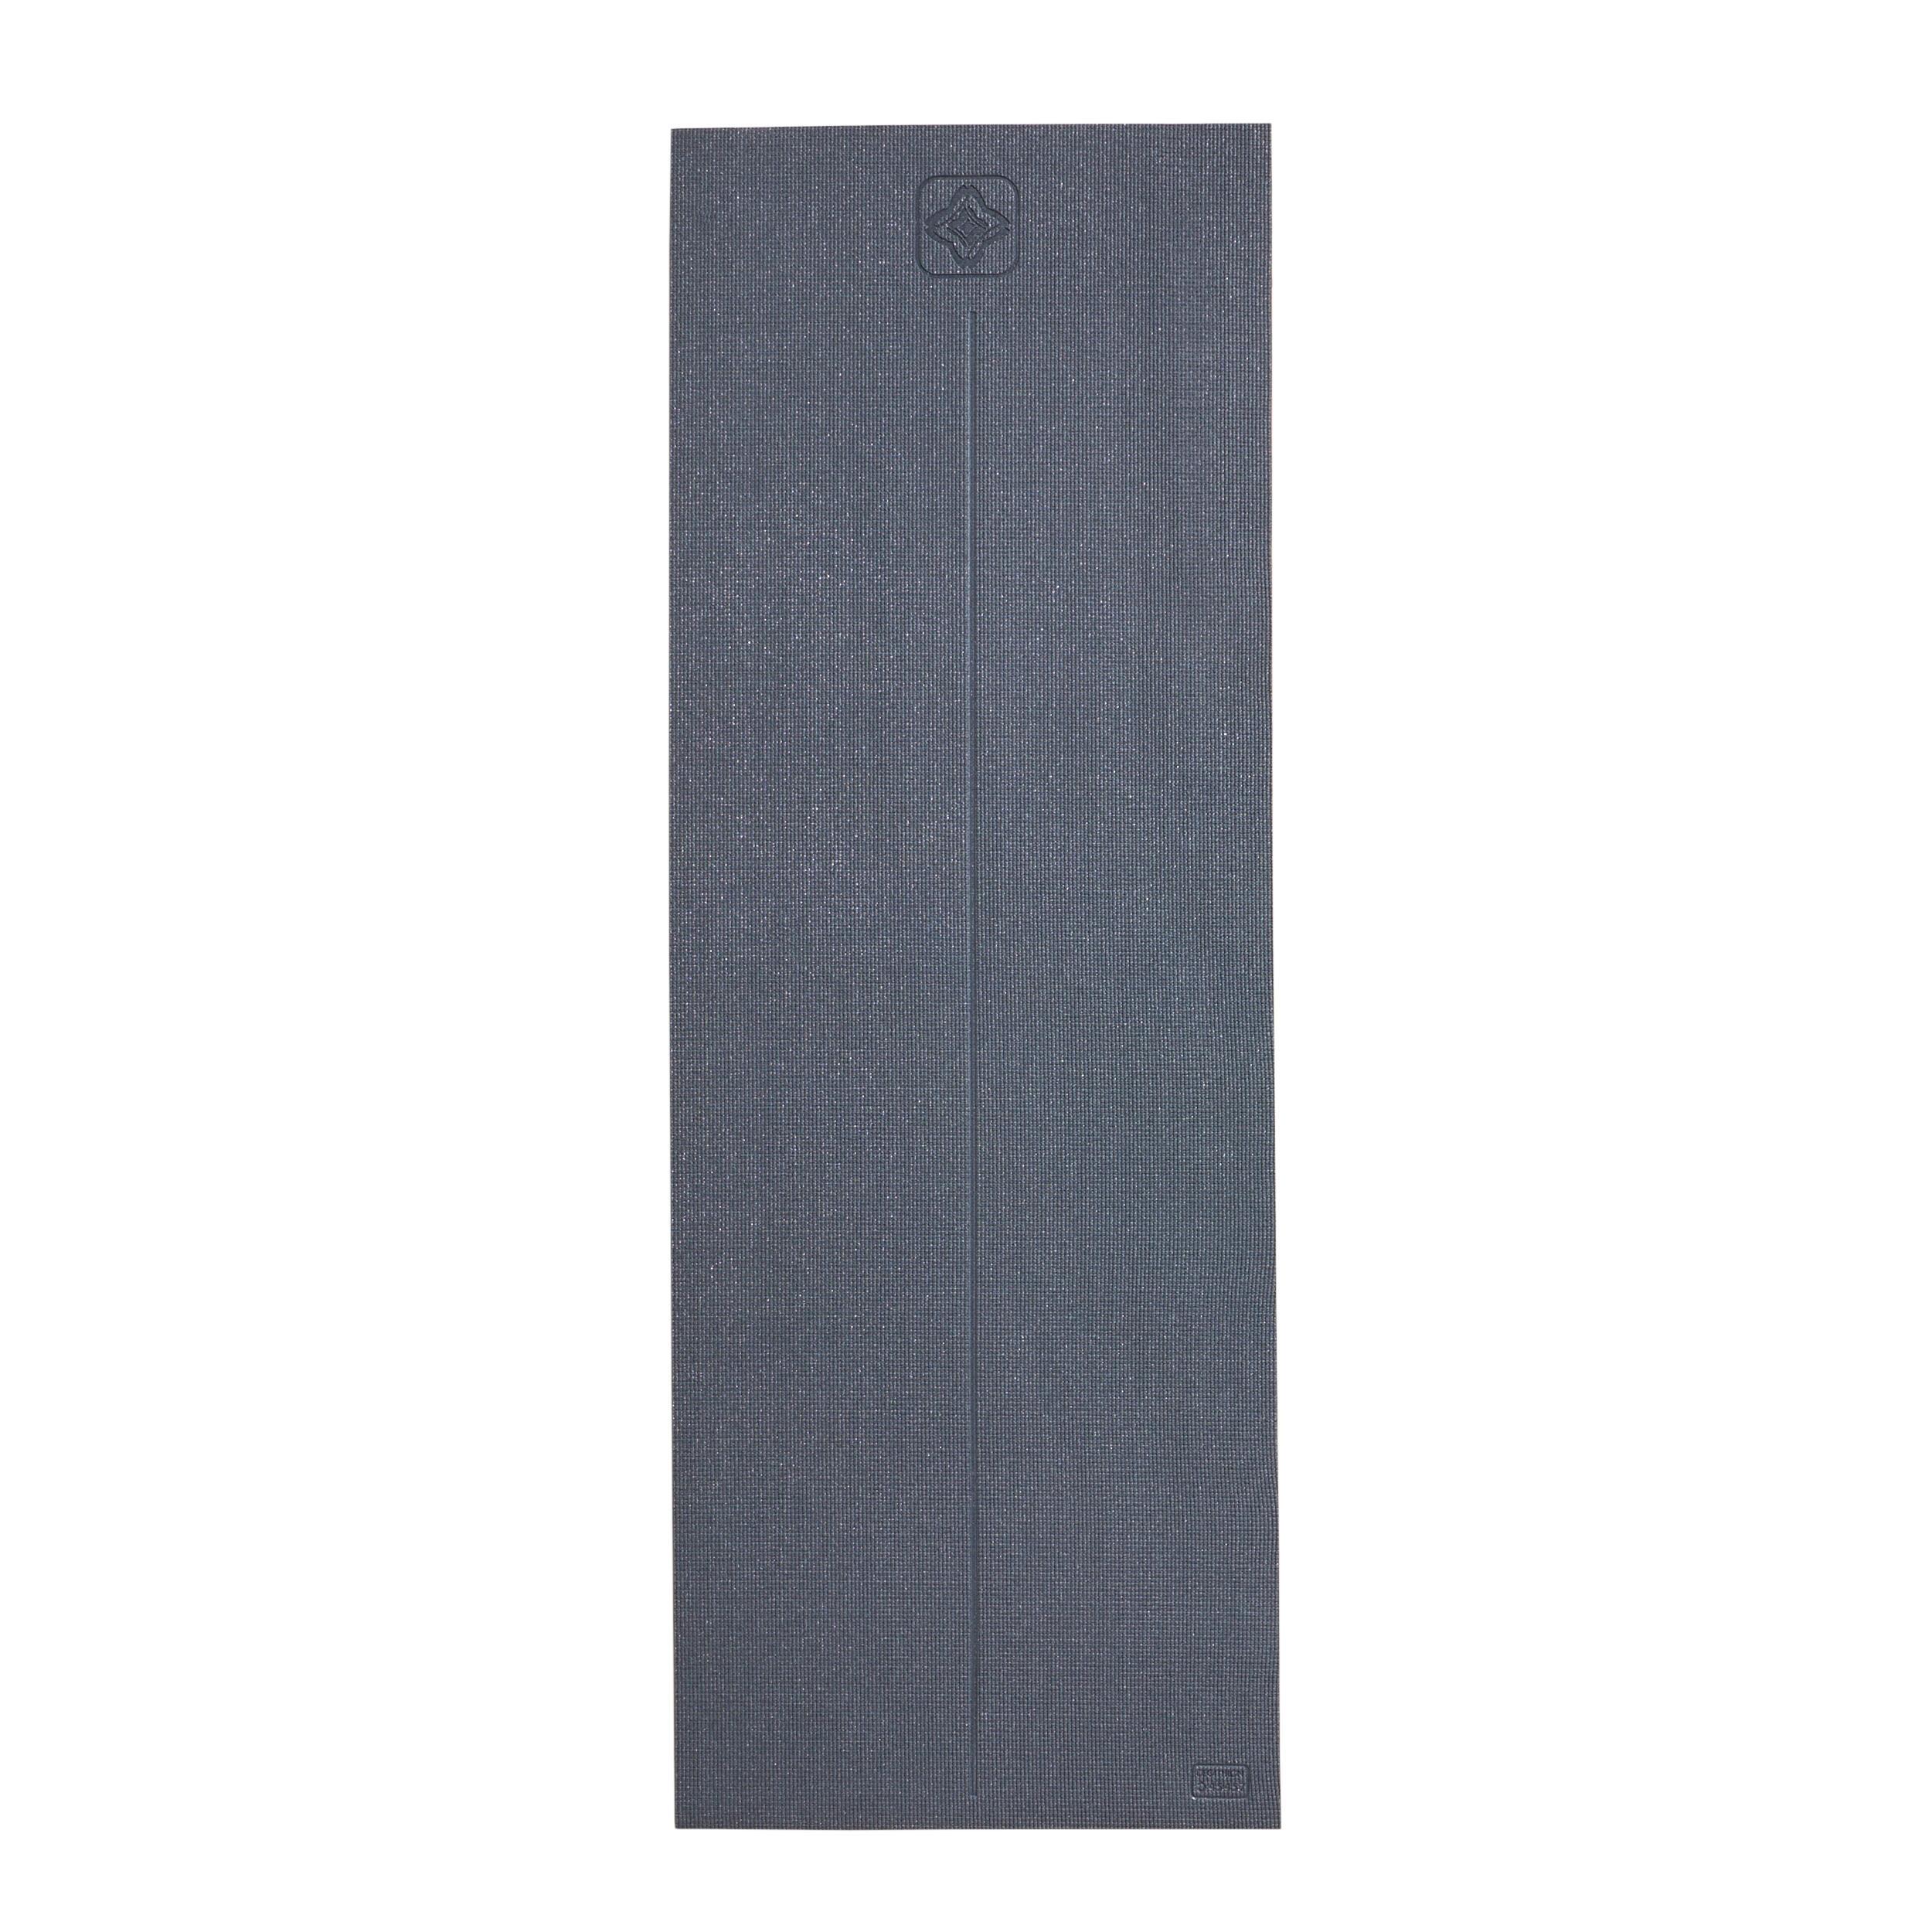 Saltea Yoga 8mm gri imagine